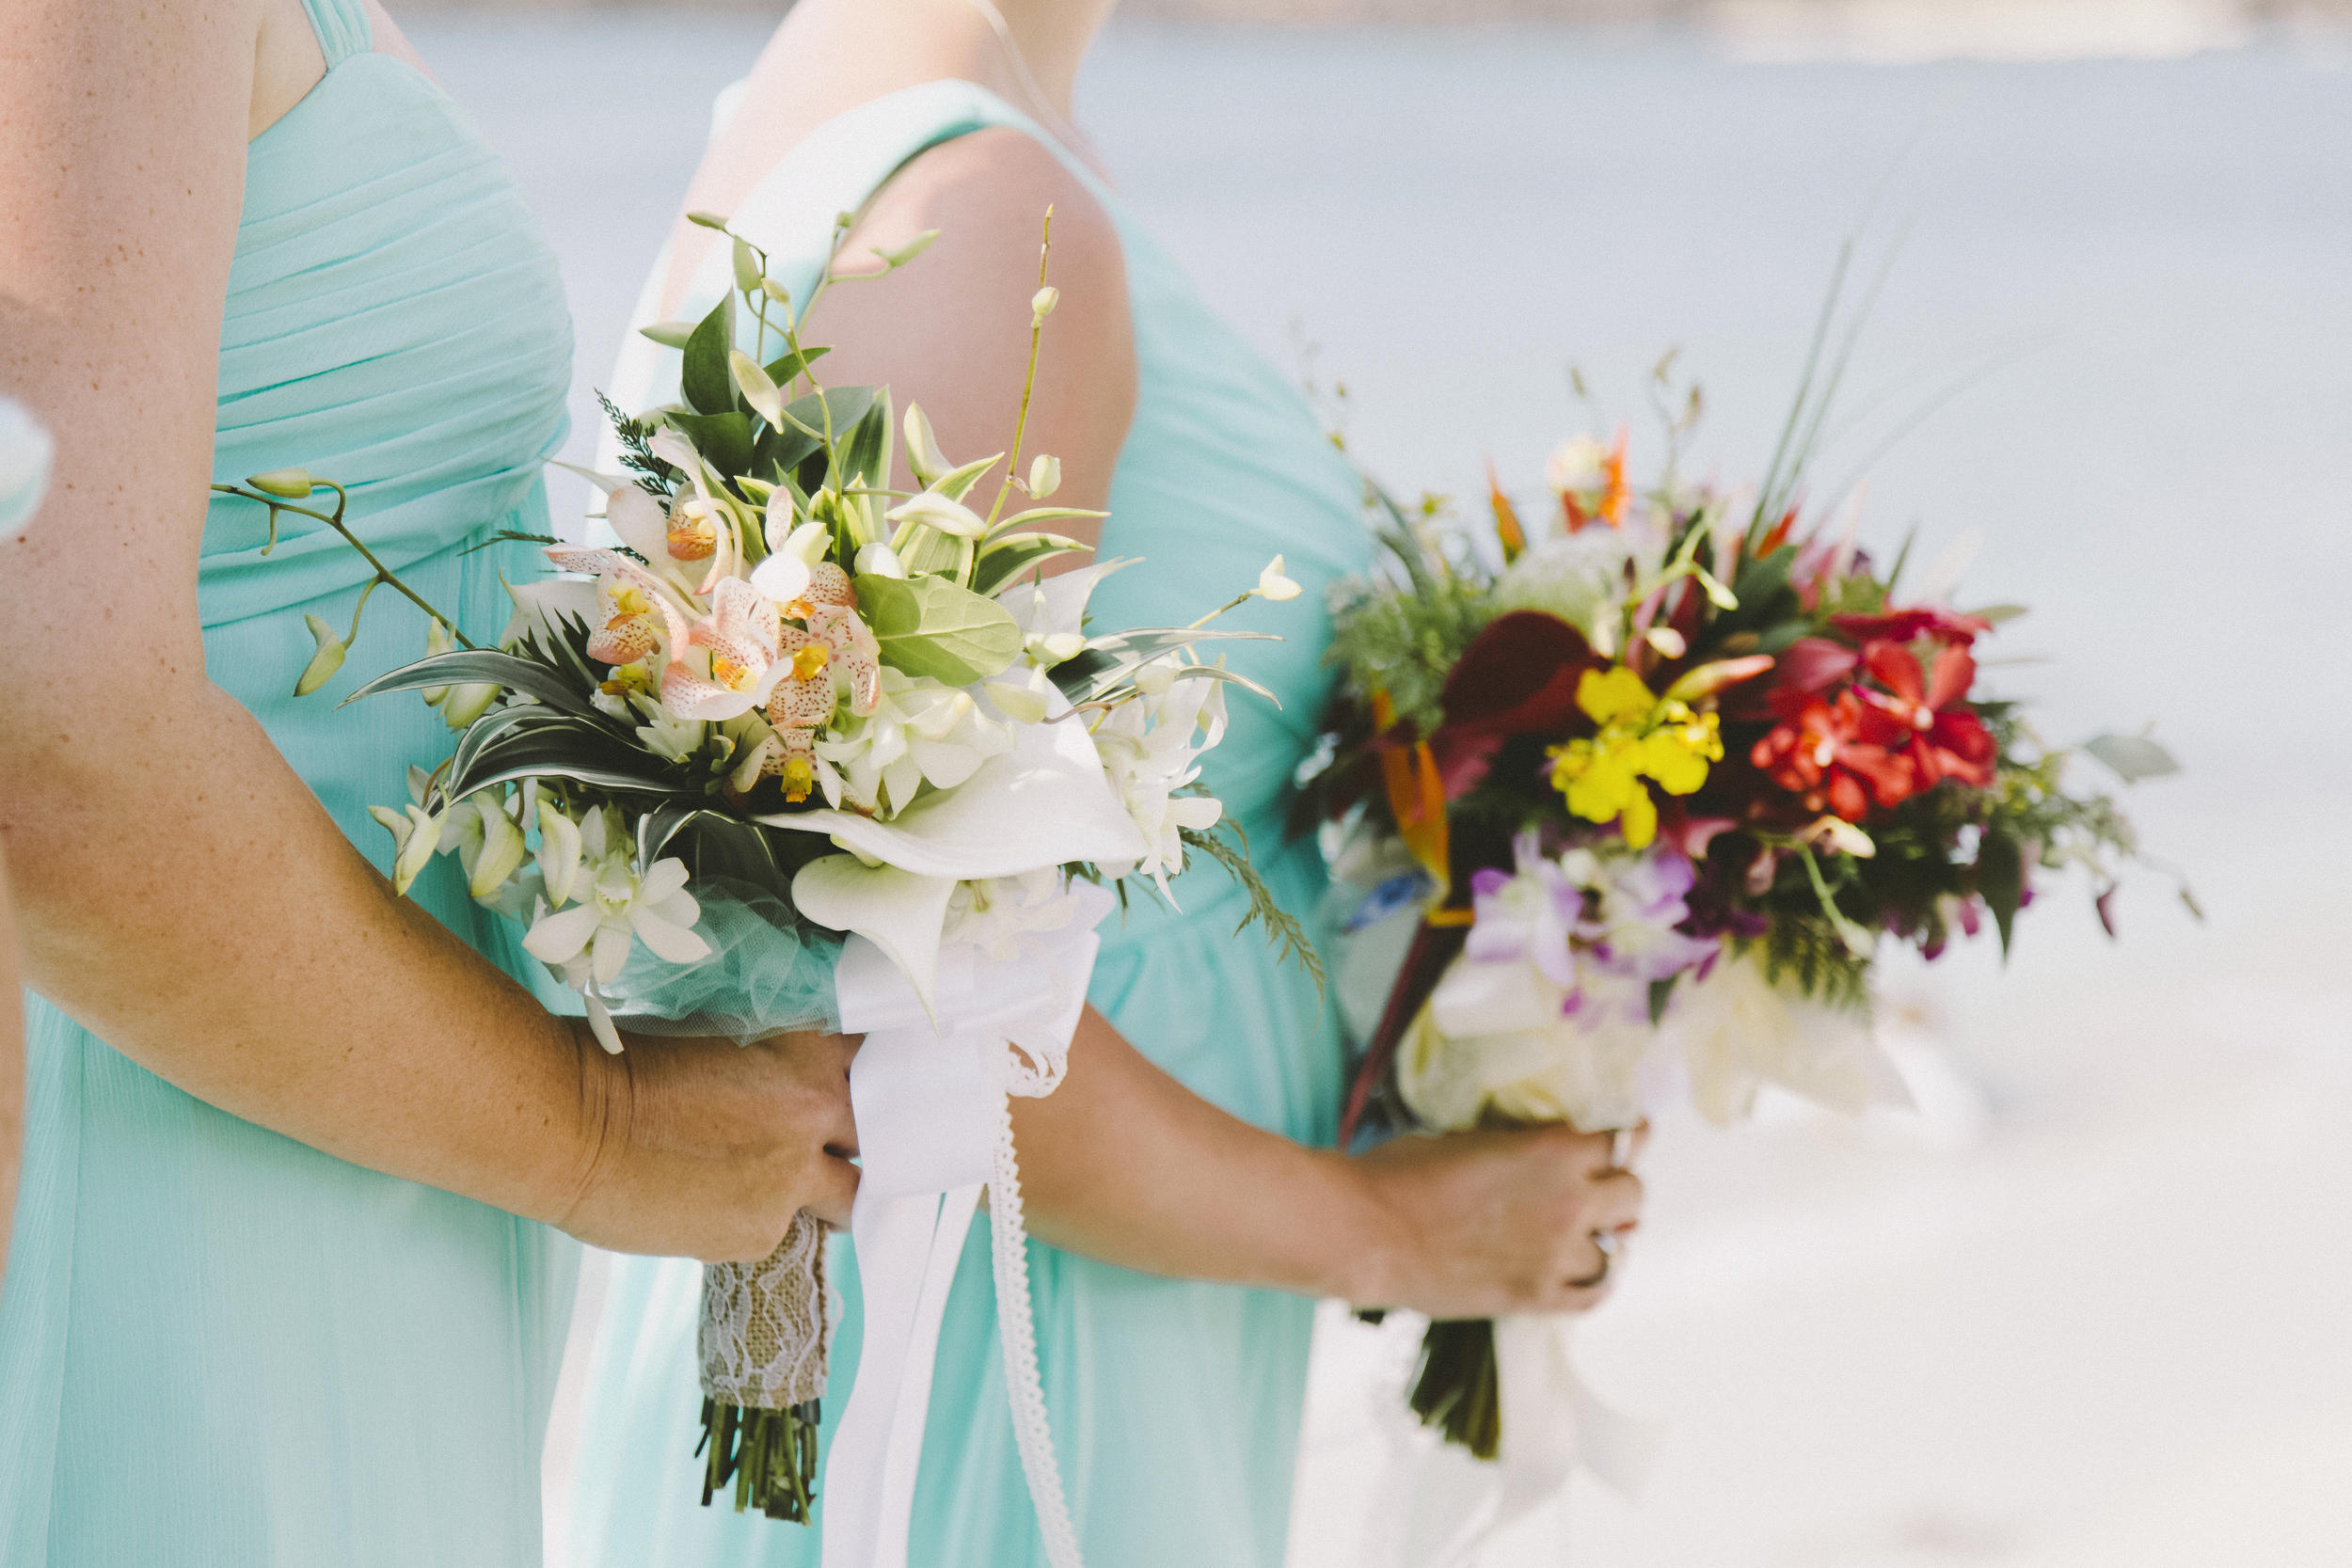 angie-diaz-photography-hawaii-wedding-photographer-kelli-jay-65.jpg